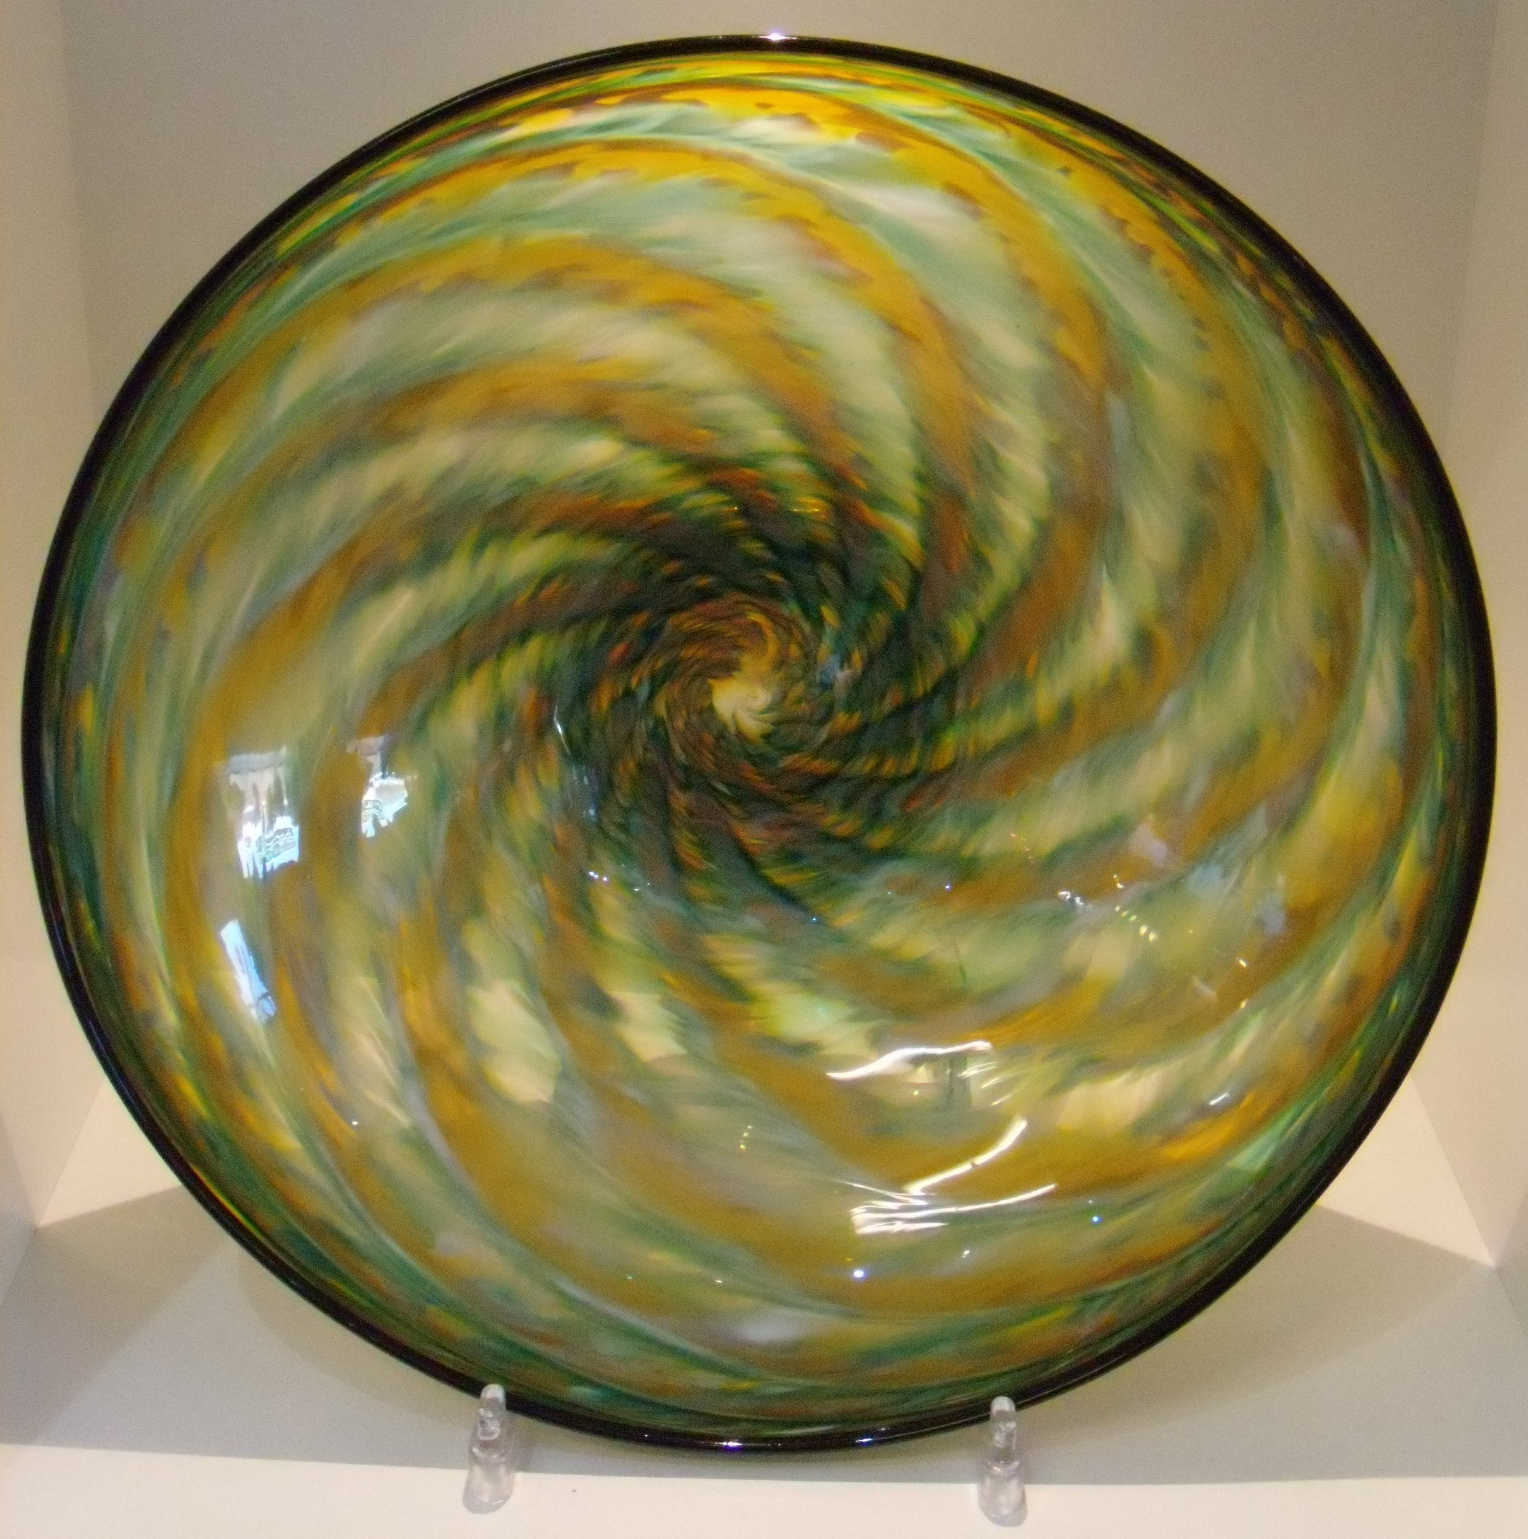 Jade/Amber Shell Bowl $219 Measures 300 mm diameter x 95 mm deep